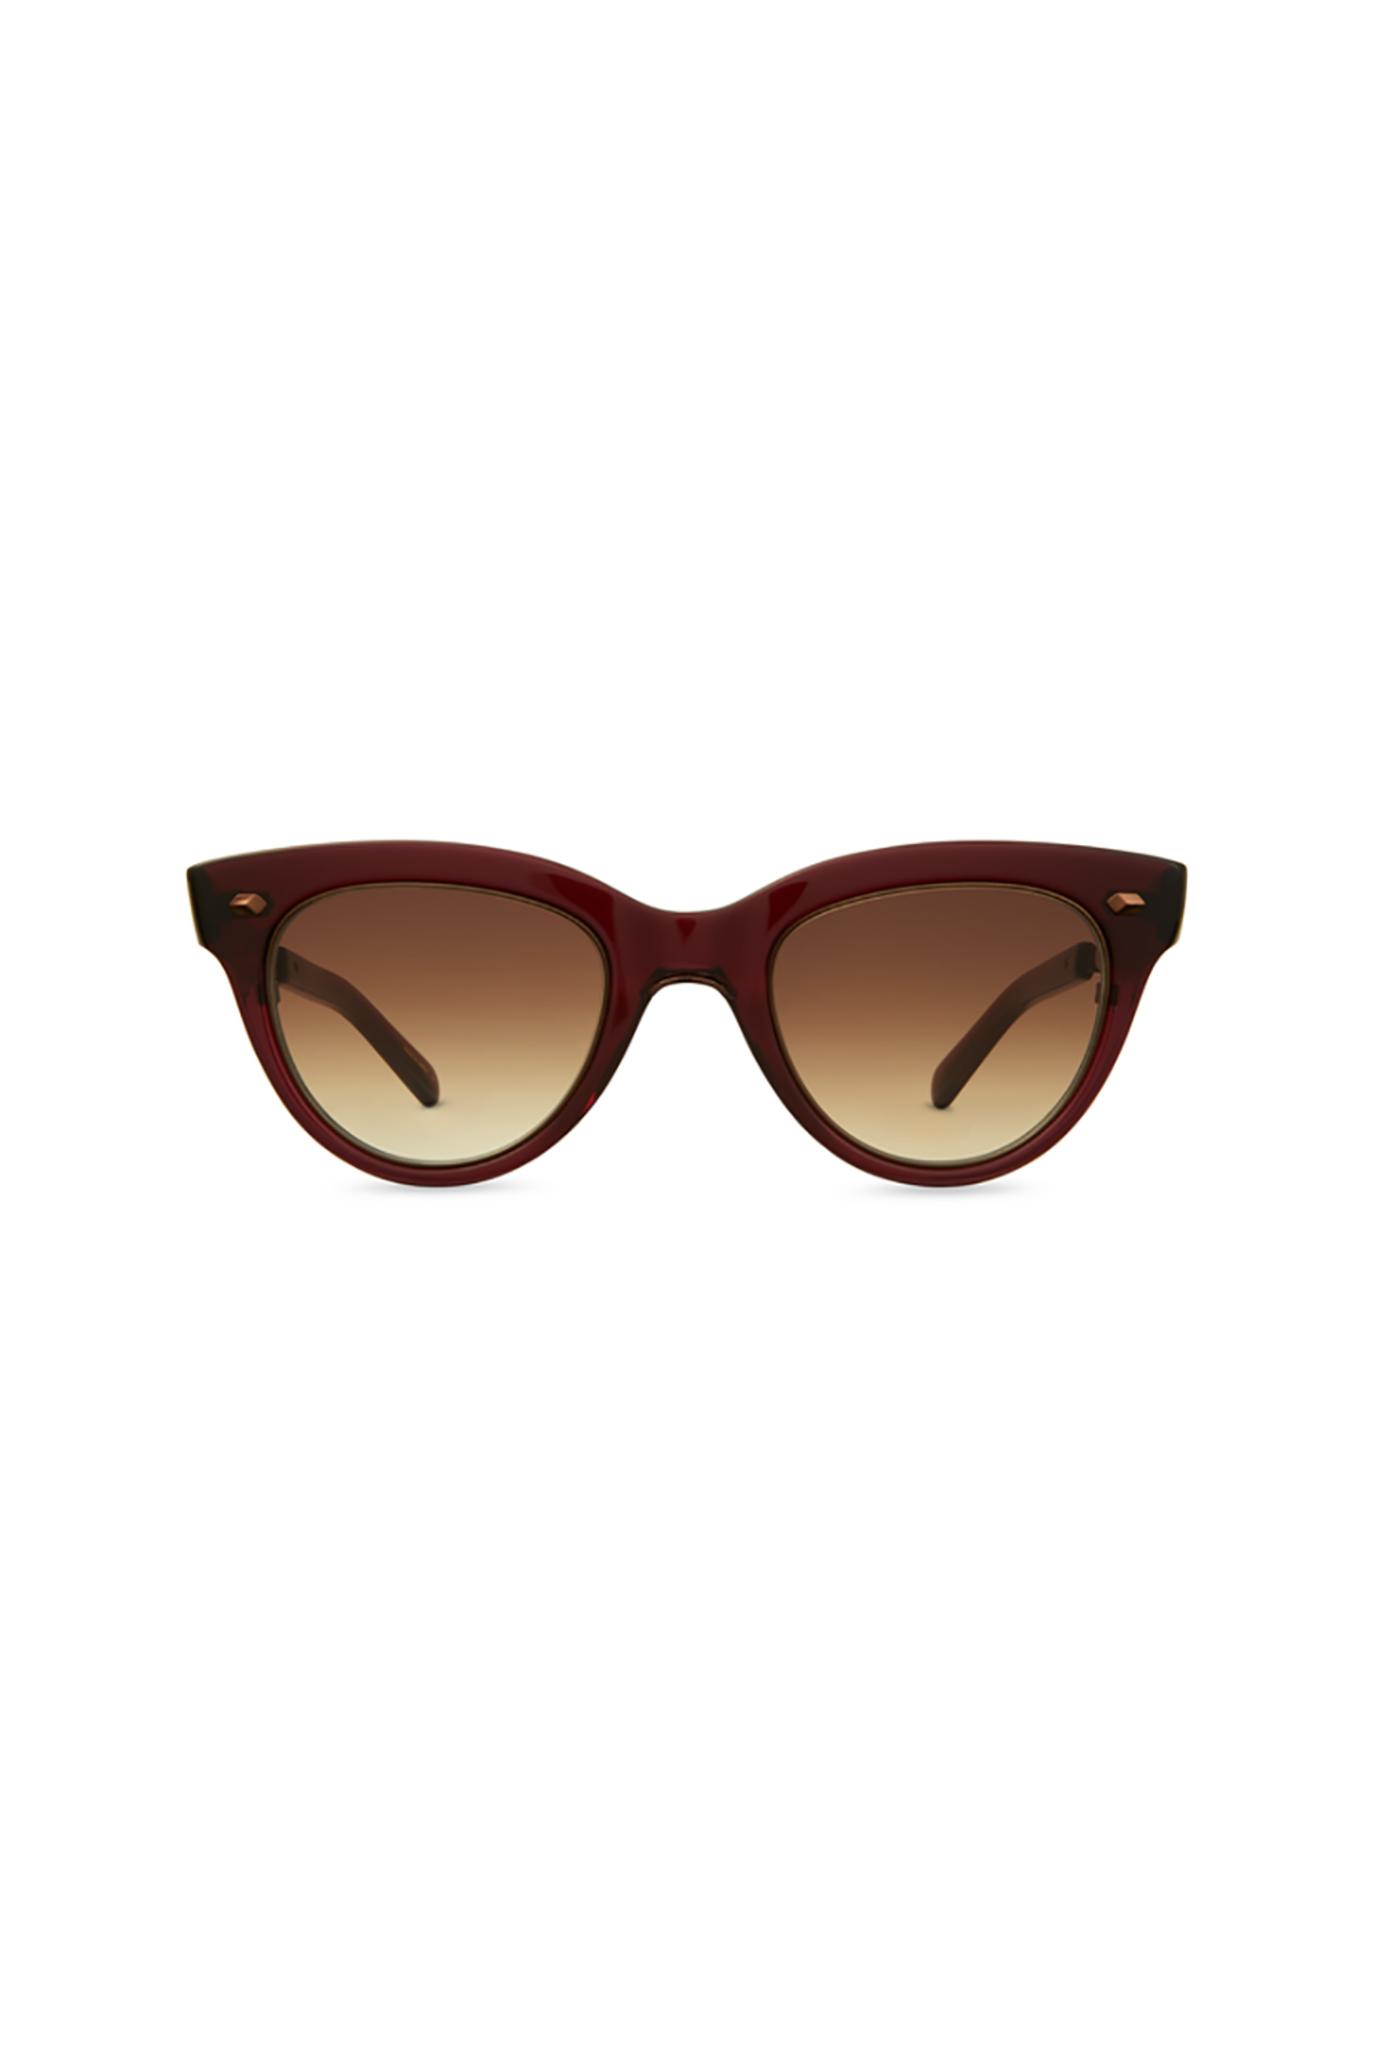 Madison S47 Roxbury-Chocolate Gold/Semi-Flat Raw Umber Gradient